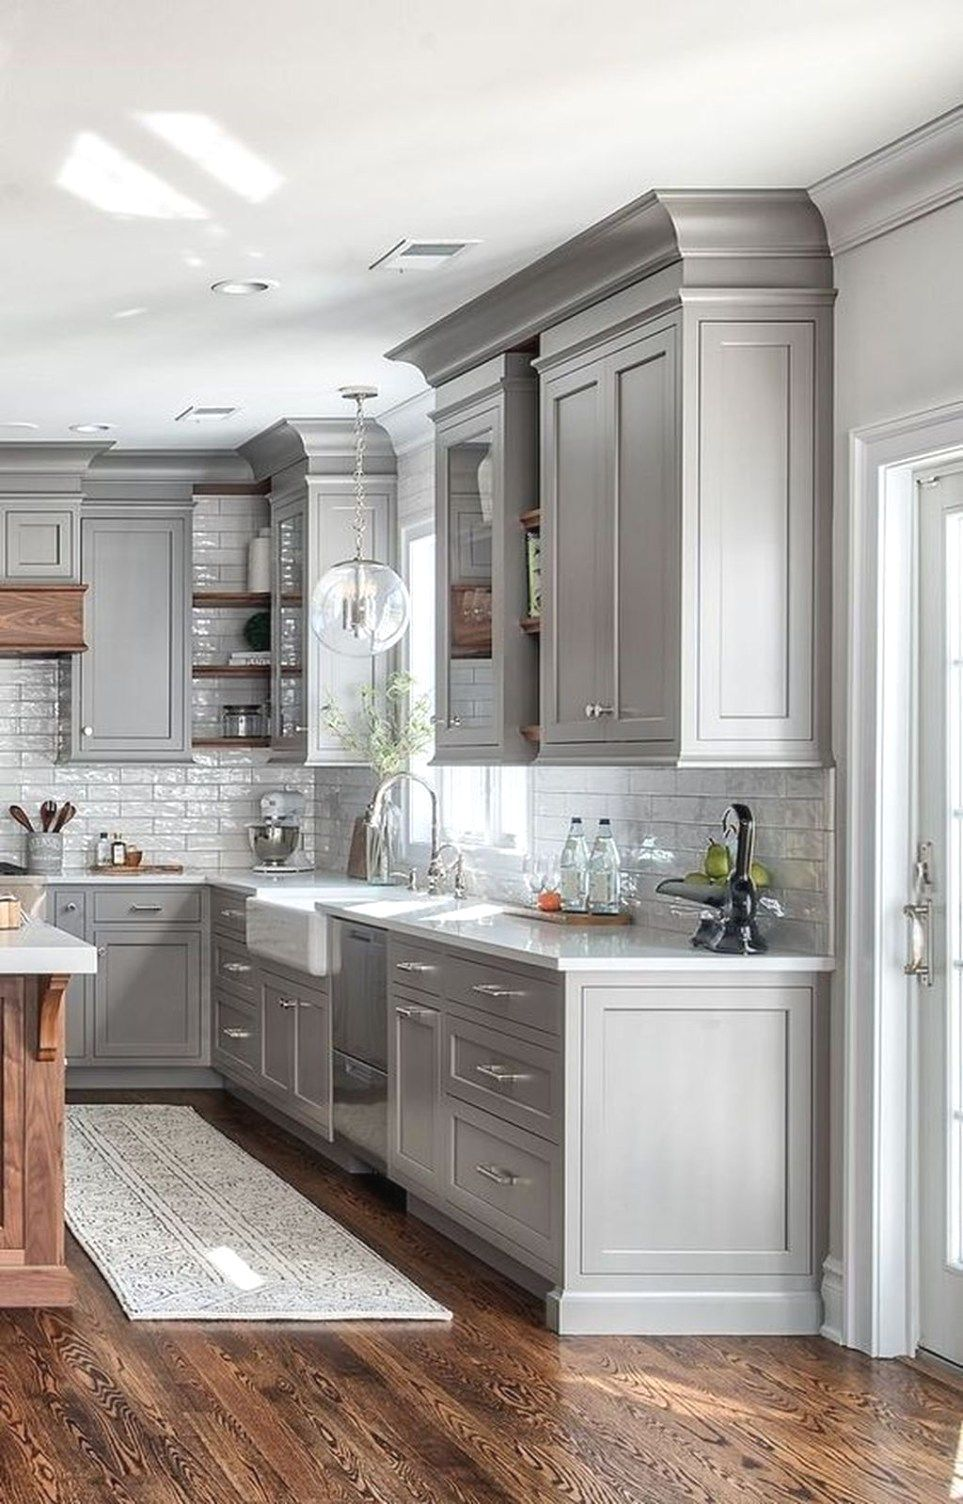 20 Best Kitchen Stylisme Blogs Websites To Follow In 2019 Entree By Jstacks3 Blogs De In 2020 Kitchen Renovation Cost White Kitchen Design Farmhouse Kitchen Design